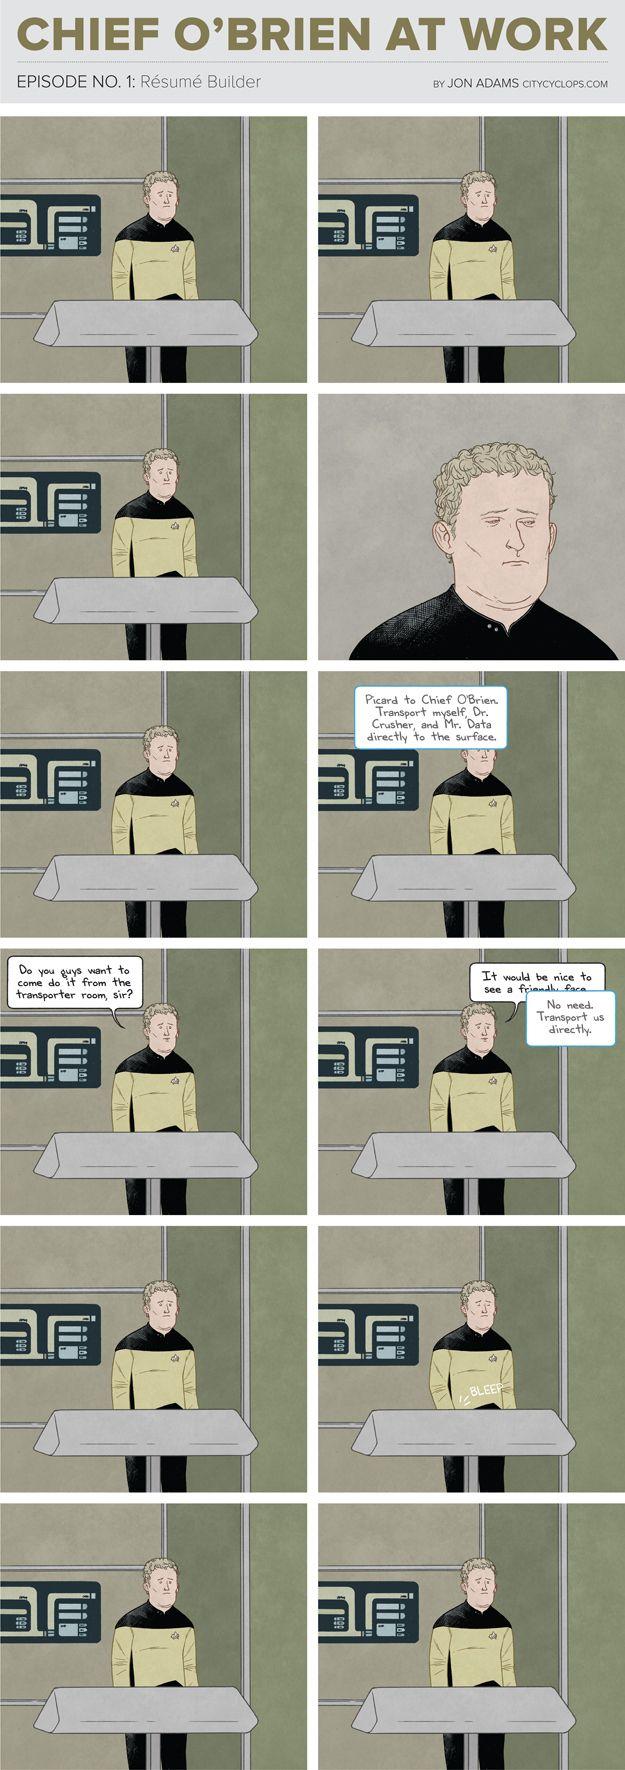 The Most Depressing Job On The Starship Enterprise. Poor O'Brien...